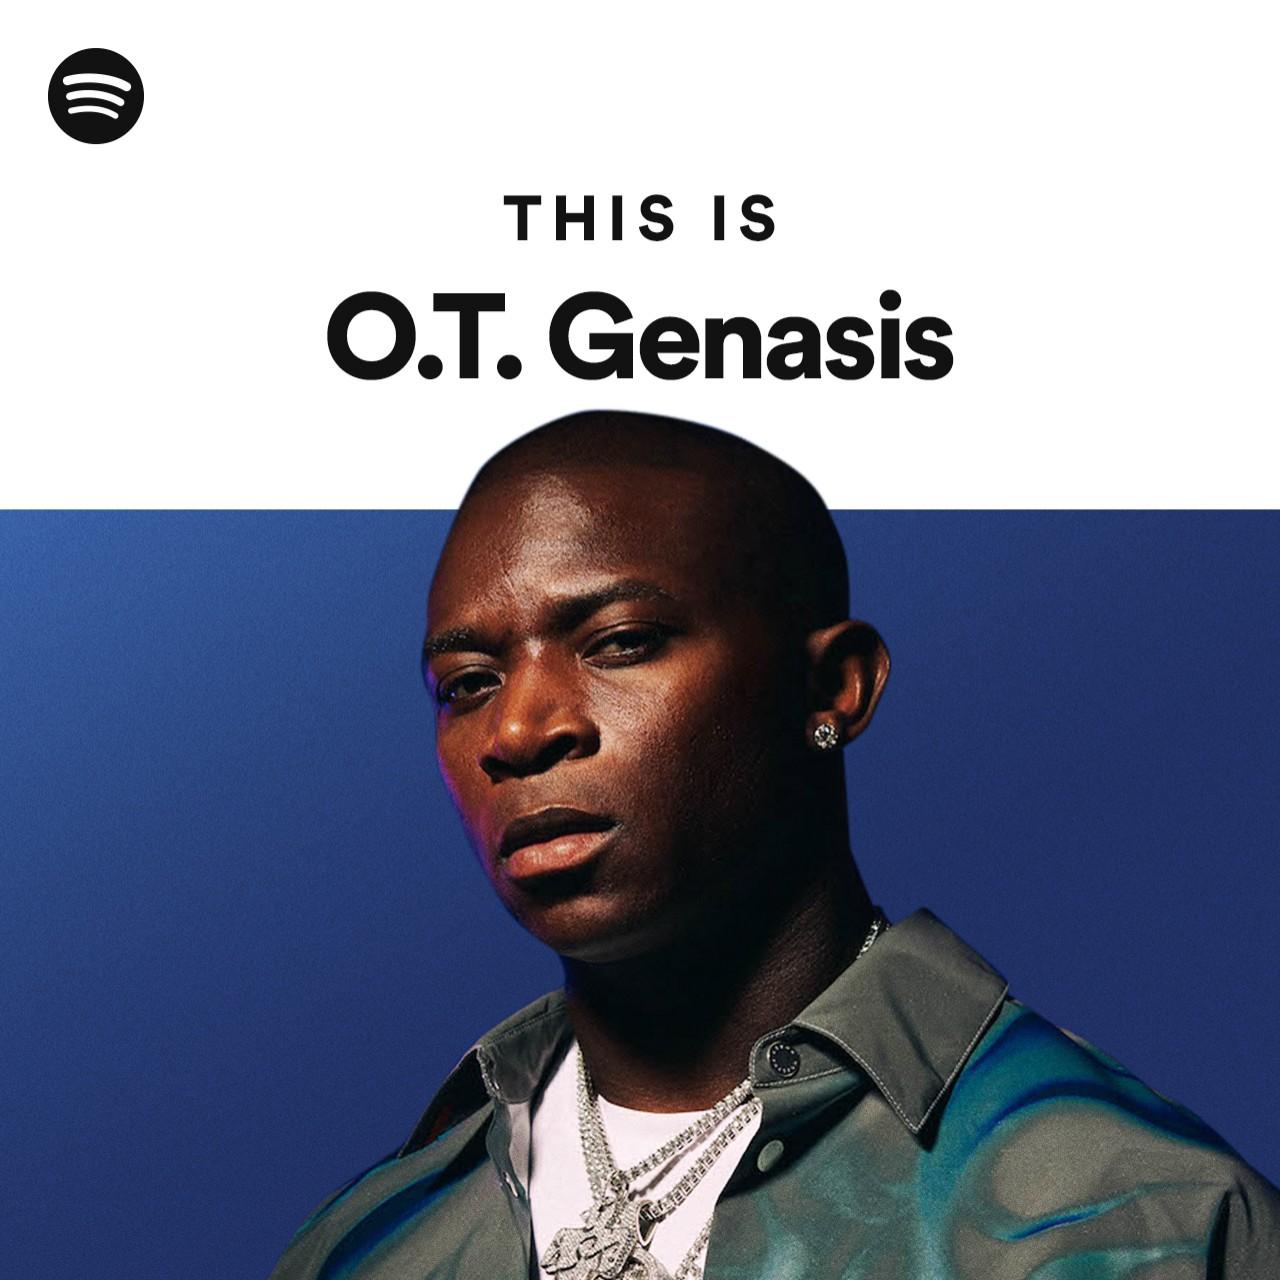 O.T. Genasis - Big Shot (feat. Mustard) - Single [iTunes